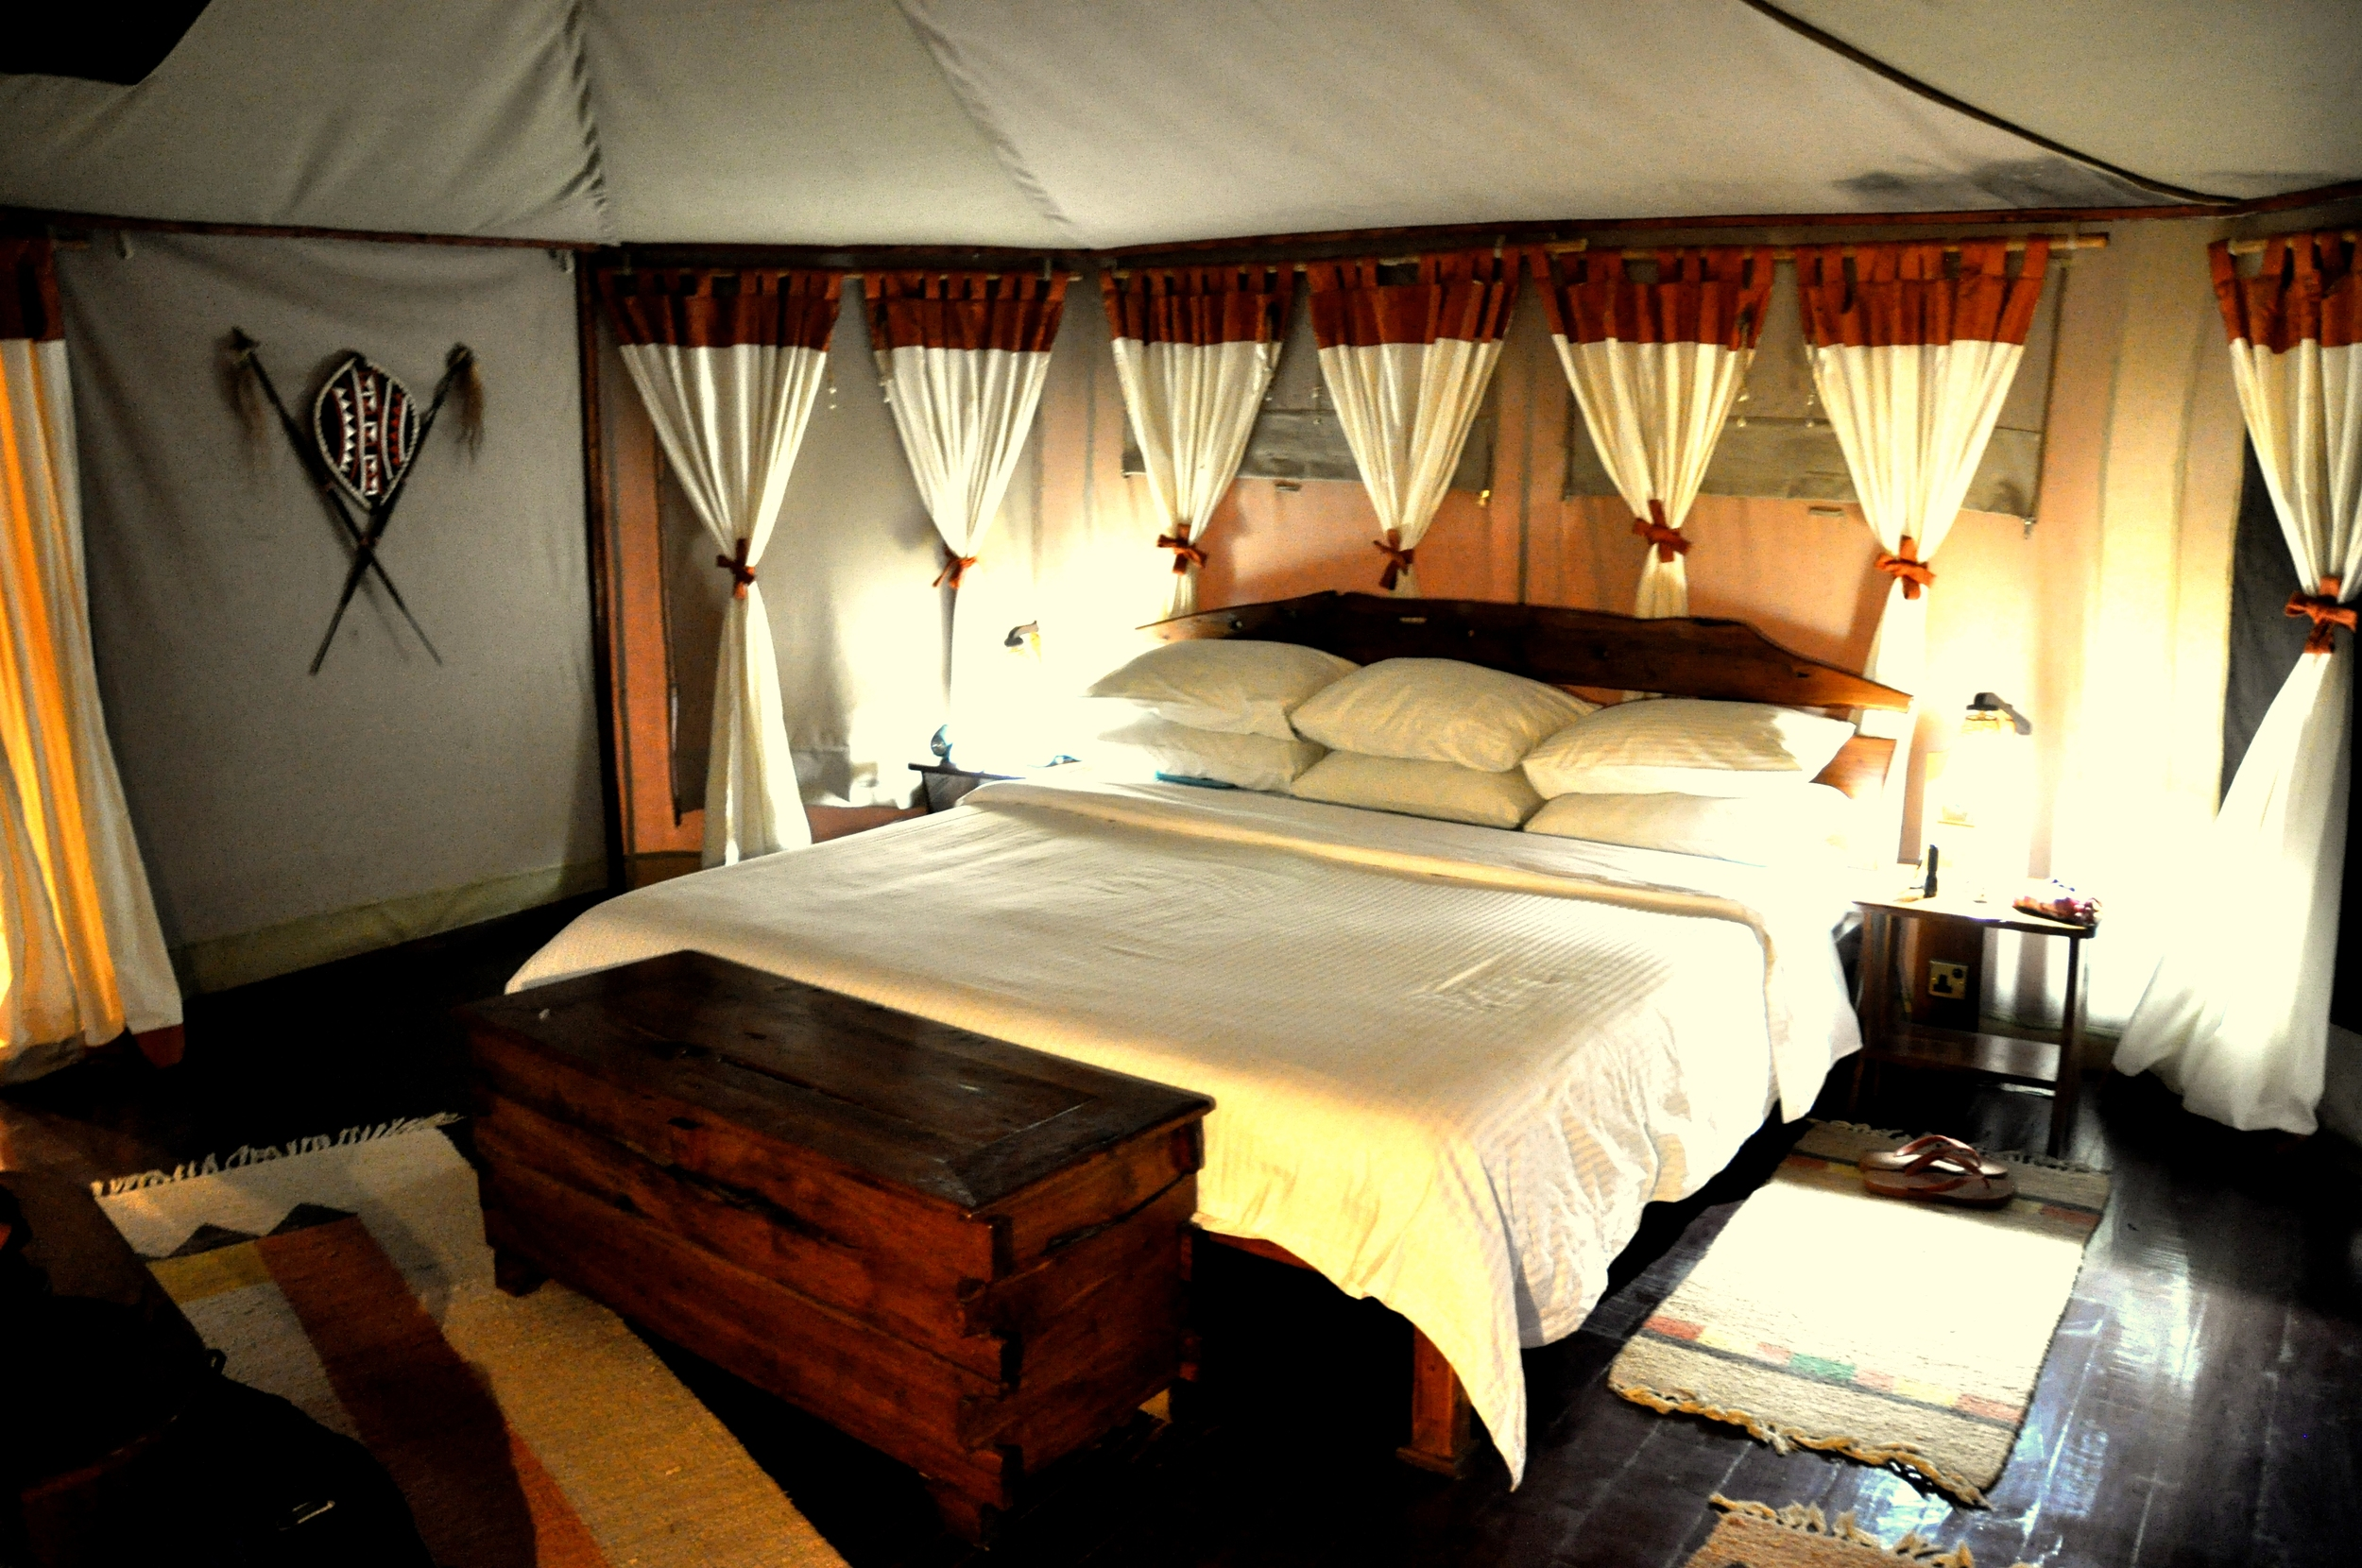 Tipilikwani Mara Camp - Maasai Mara, Kenya, Africa